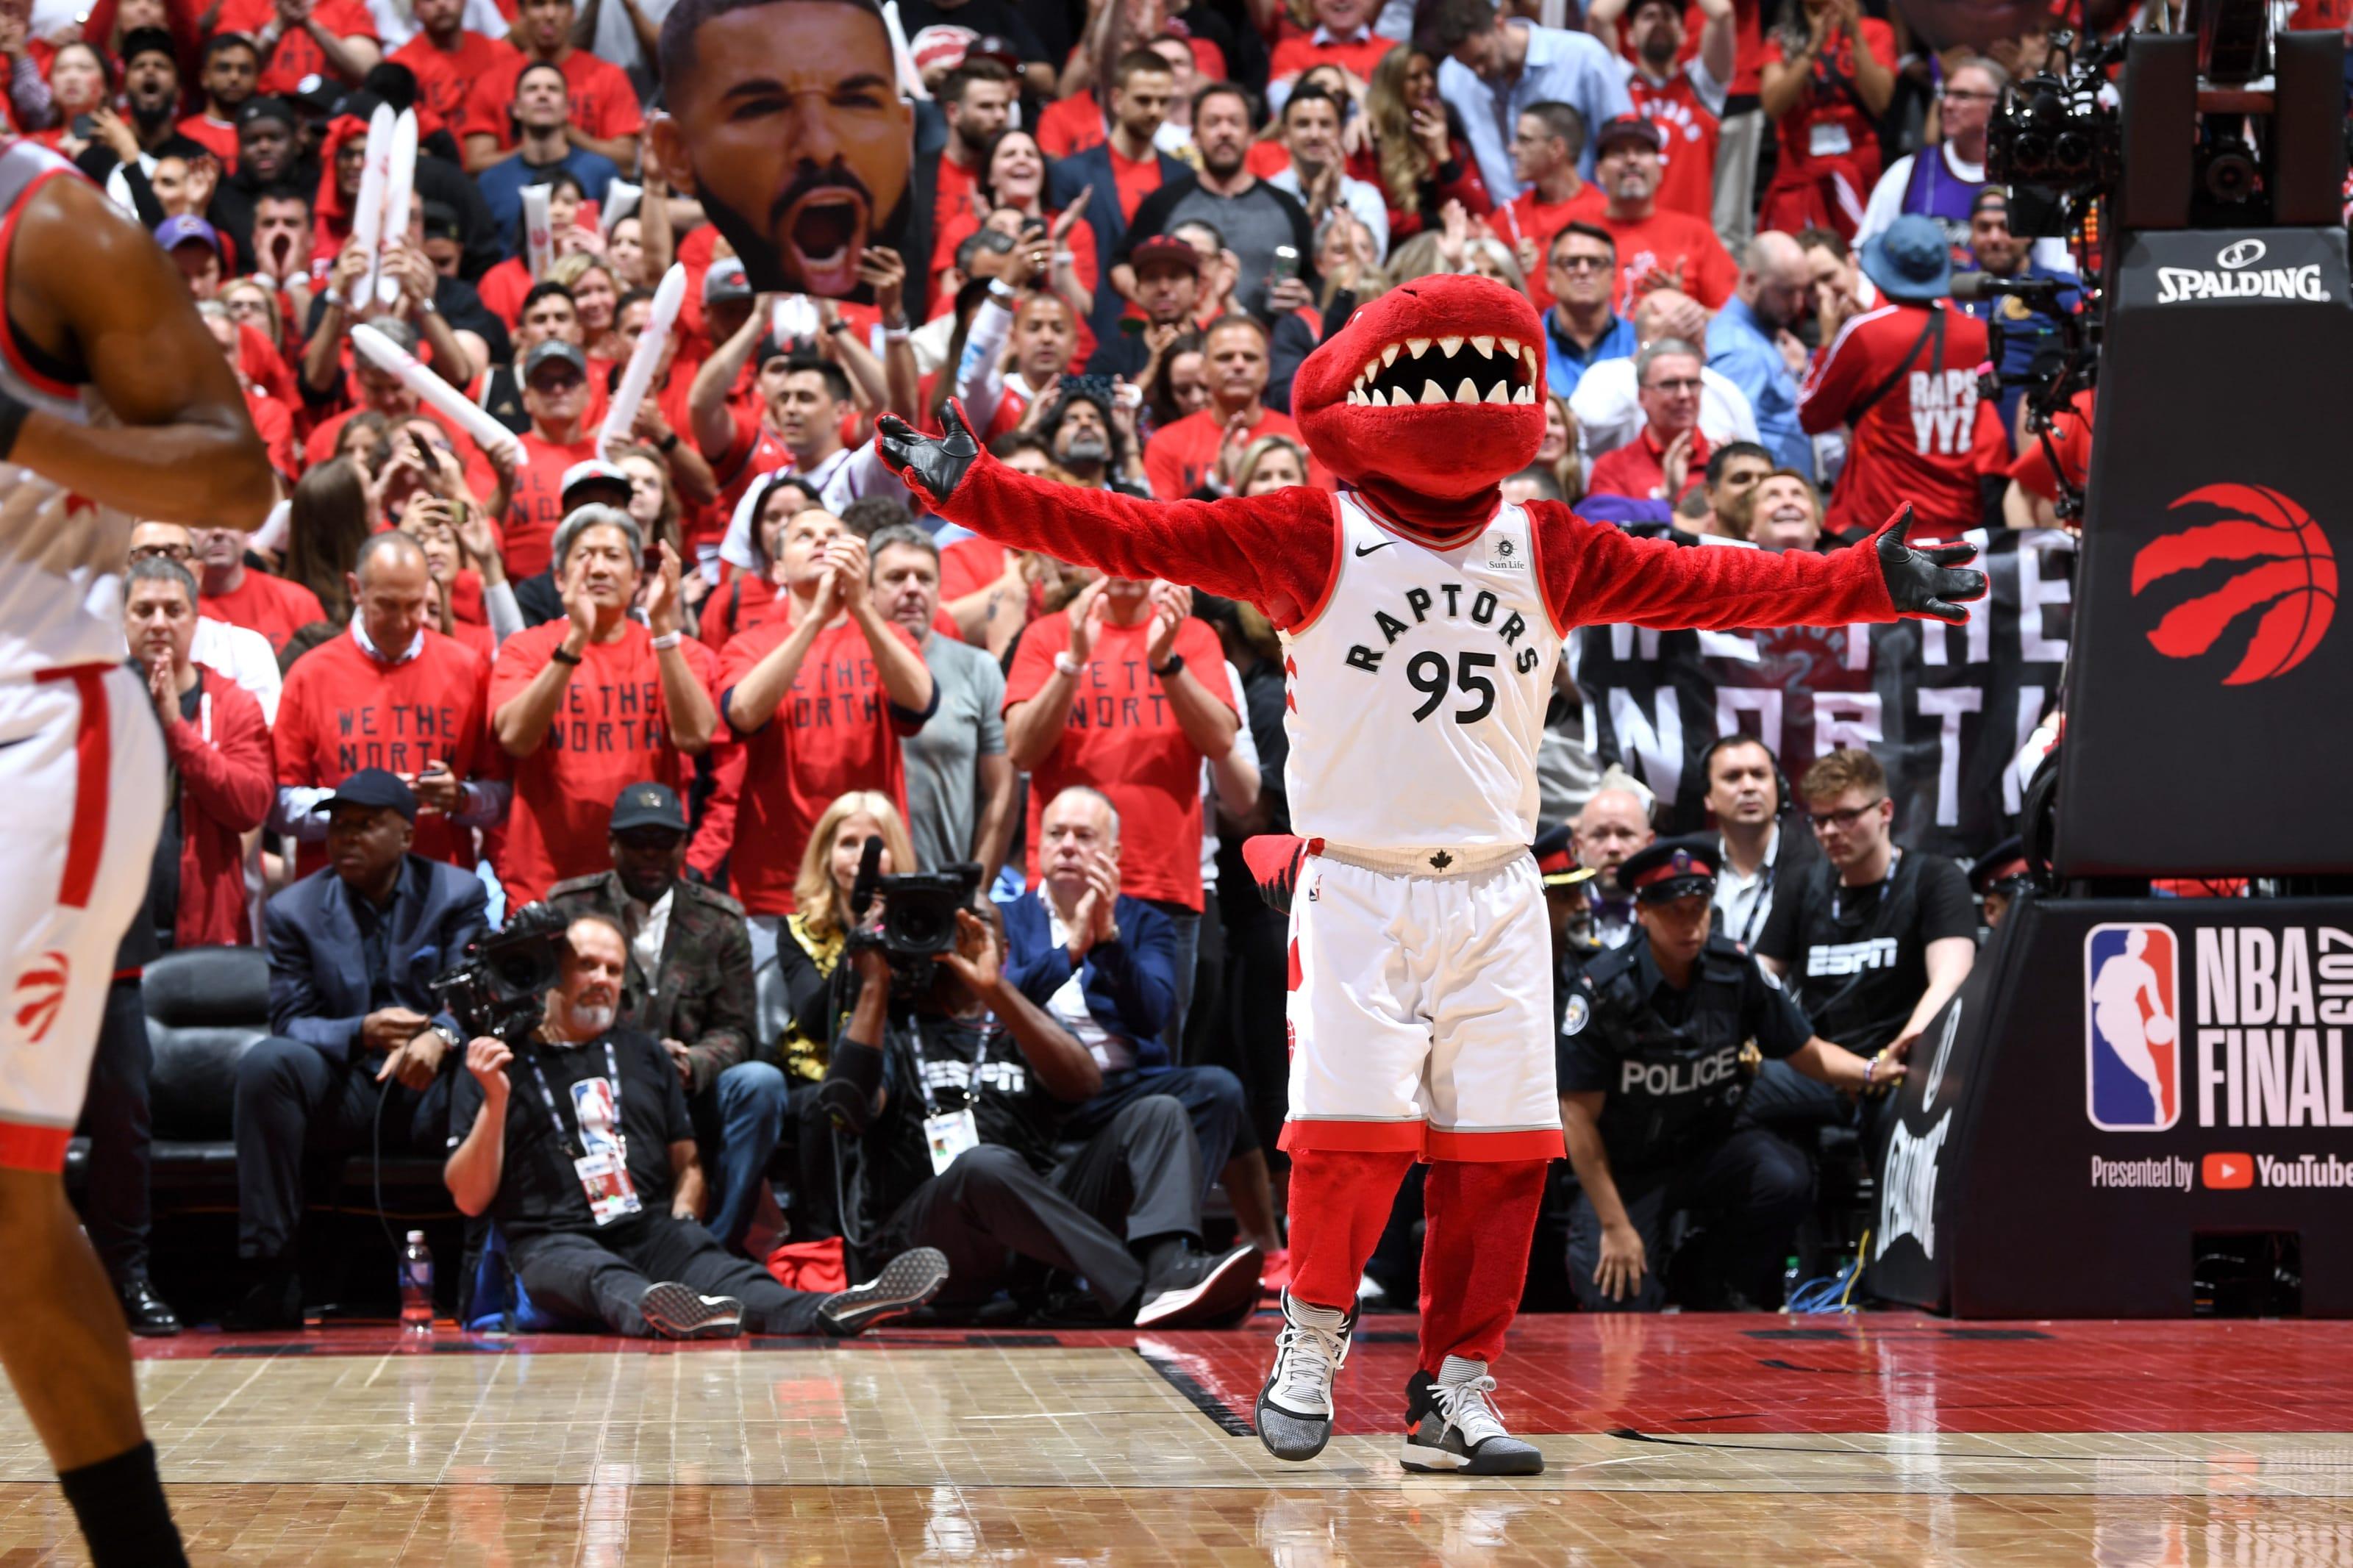 Toronto Raptors 3 Takeaways From Game 5 Loss Of 2019 Nba Finals